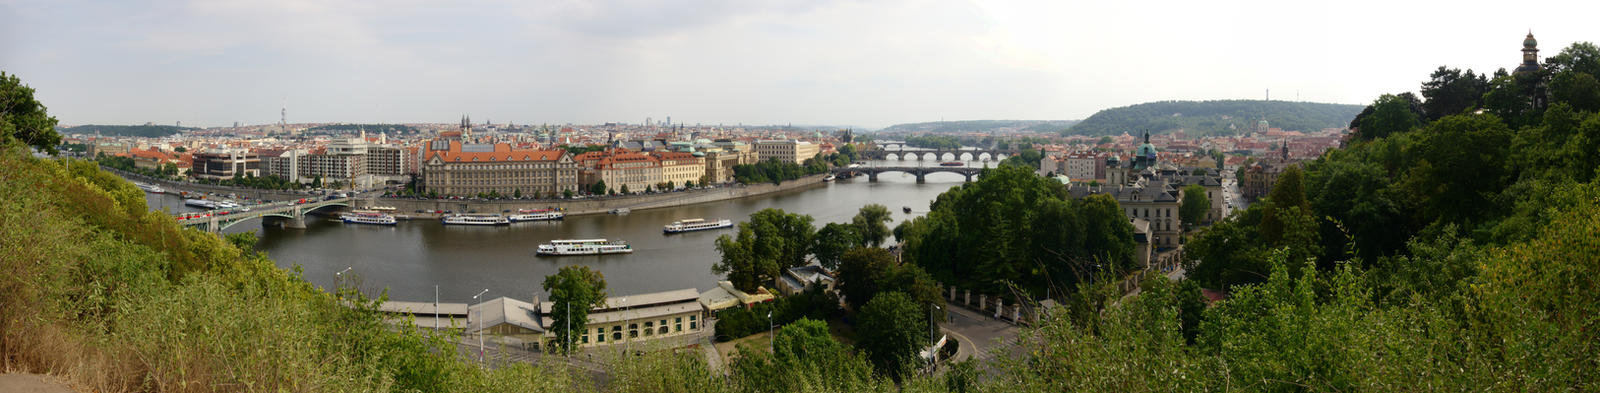 Vltava Panorama by dseomn